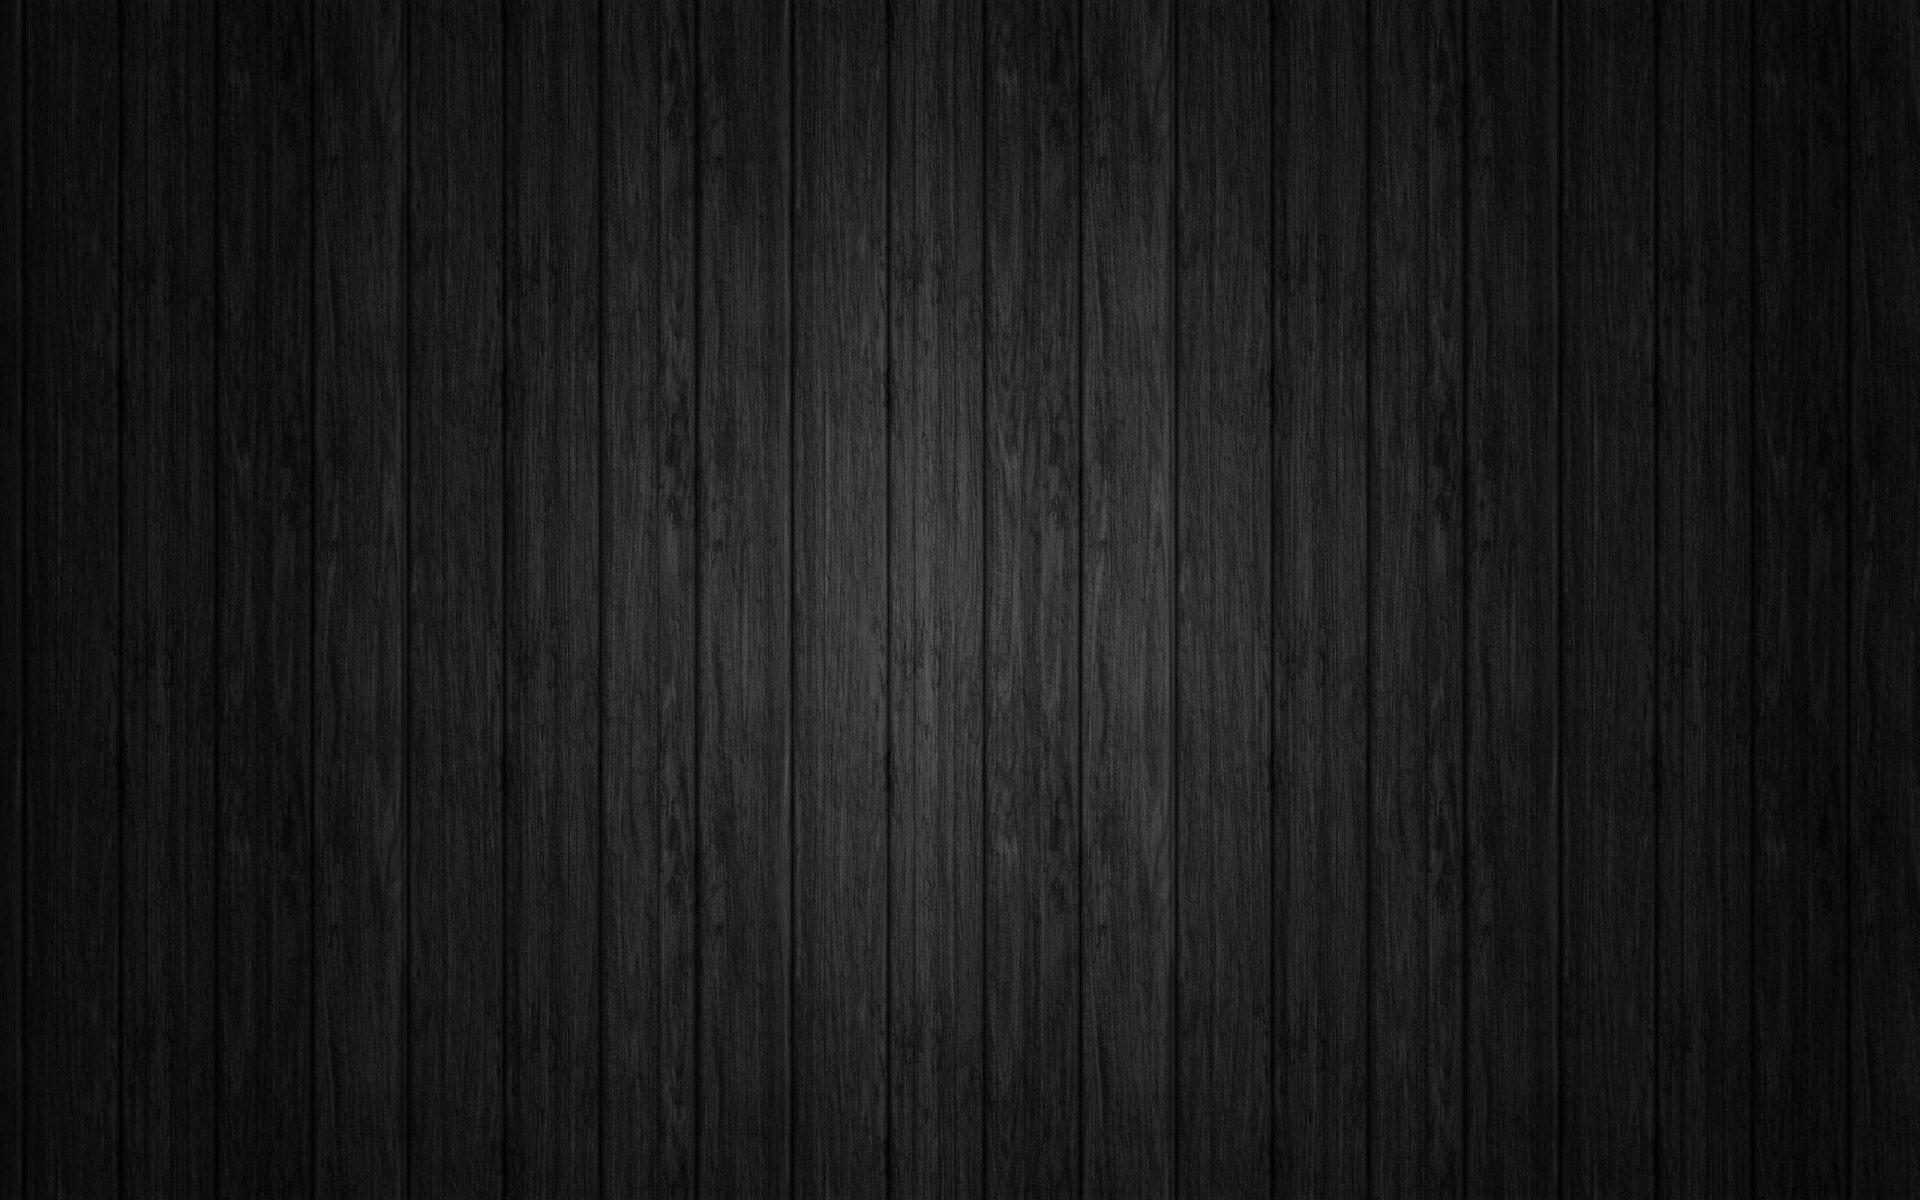 black texture wallpaper background